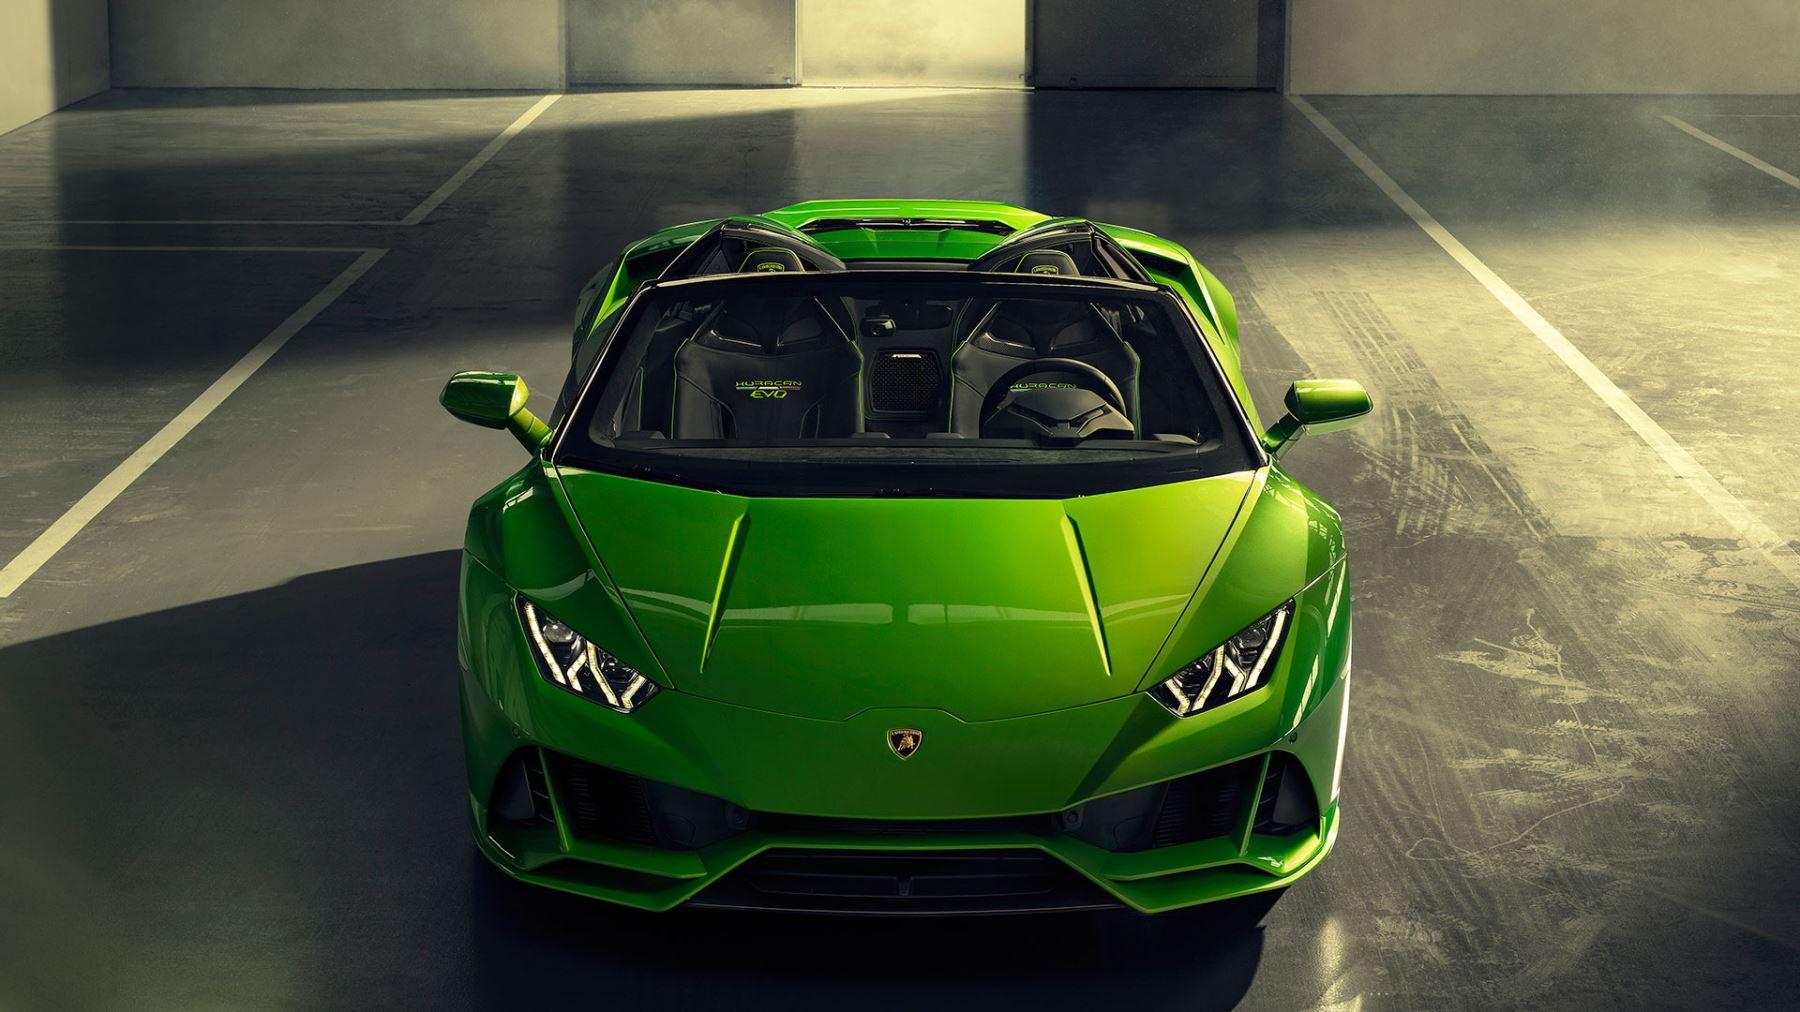 Lamborghini Huracan EVO Spyder - Every Day Amplified image 4